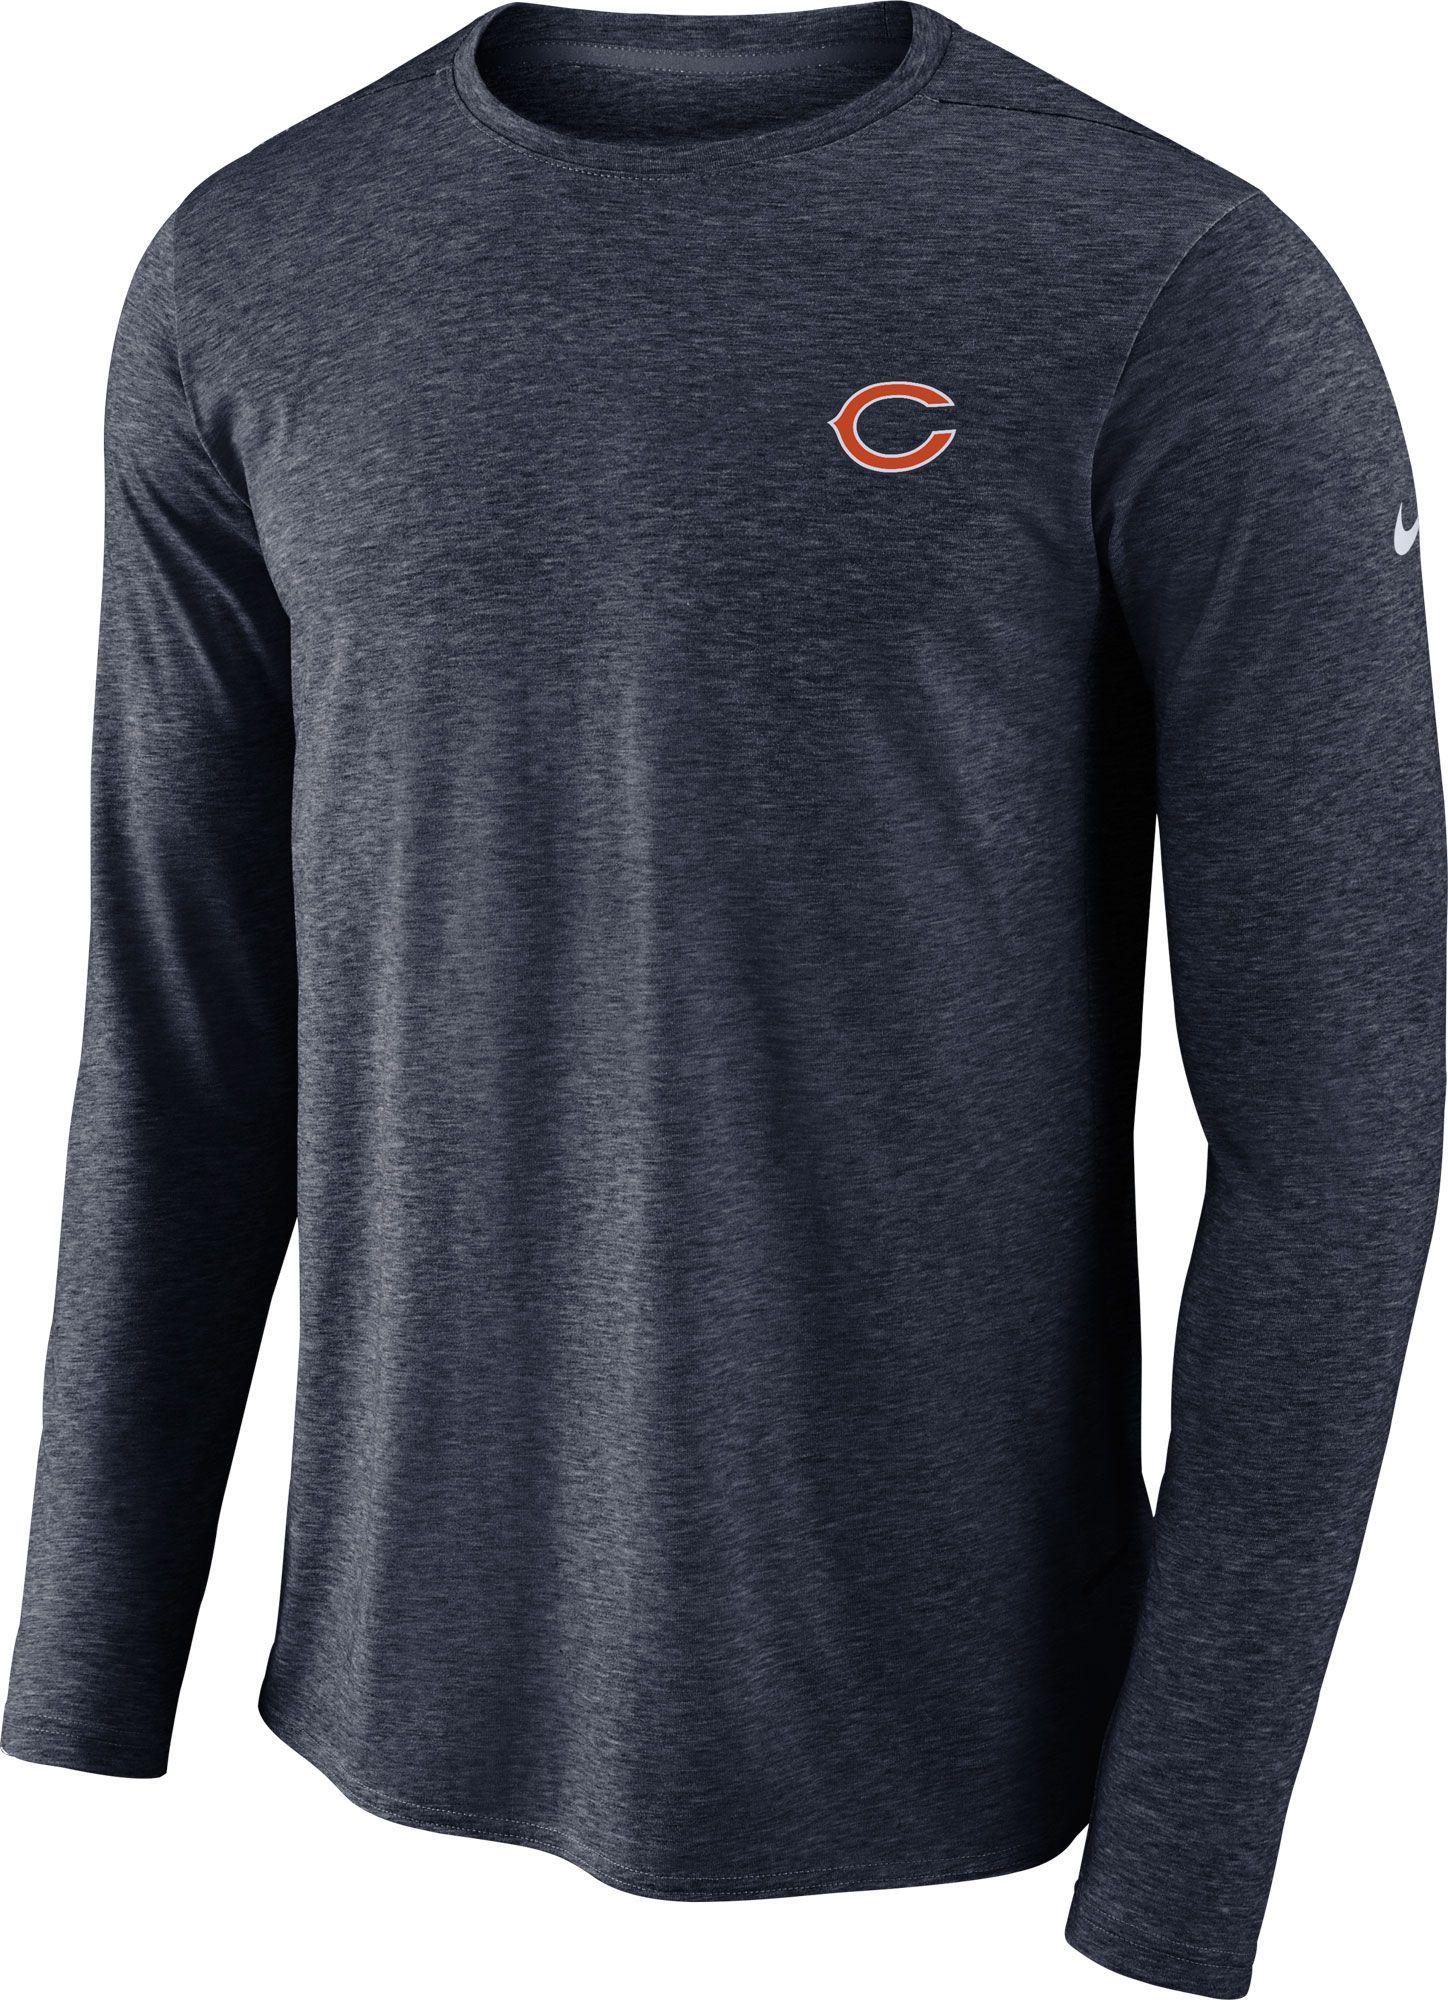 1803c6296812 Nike Men s Chicago Sideline Coaches Performance Navy Long Sleeve Shirt